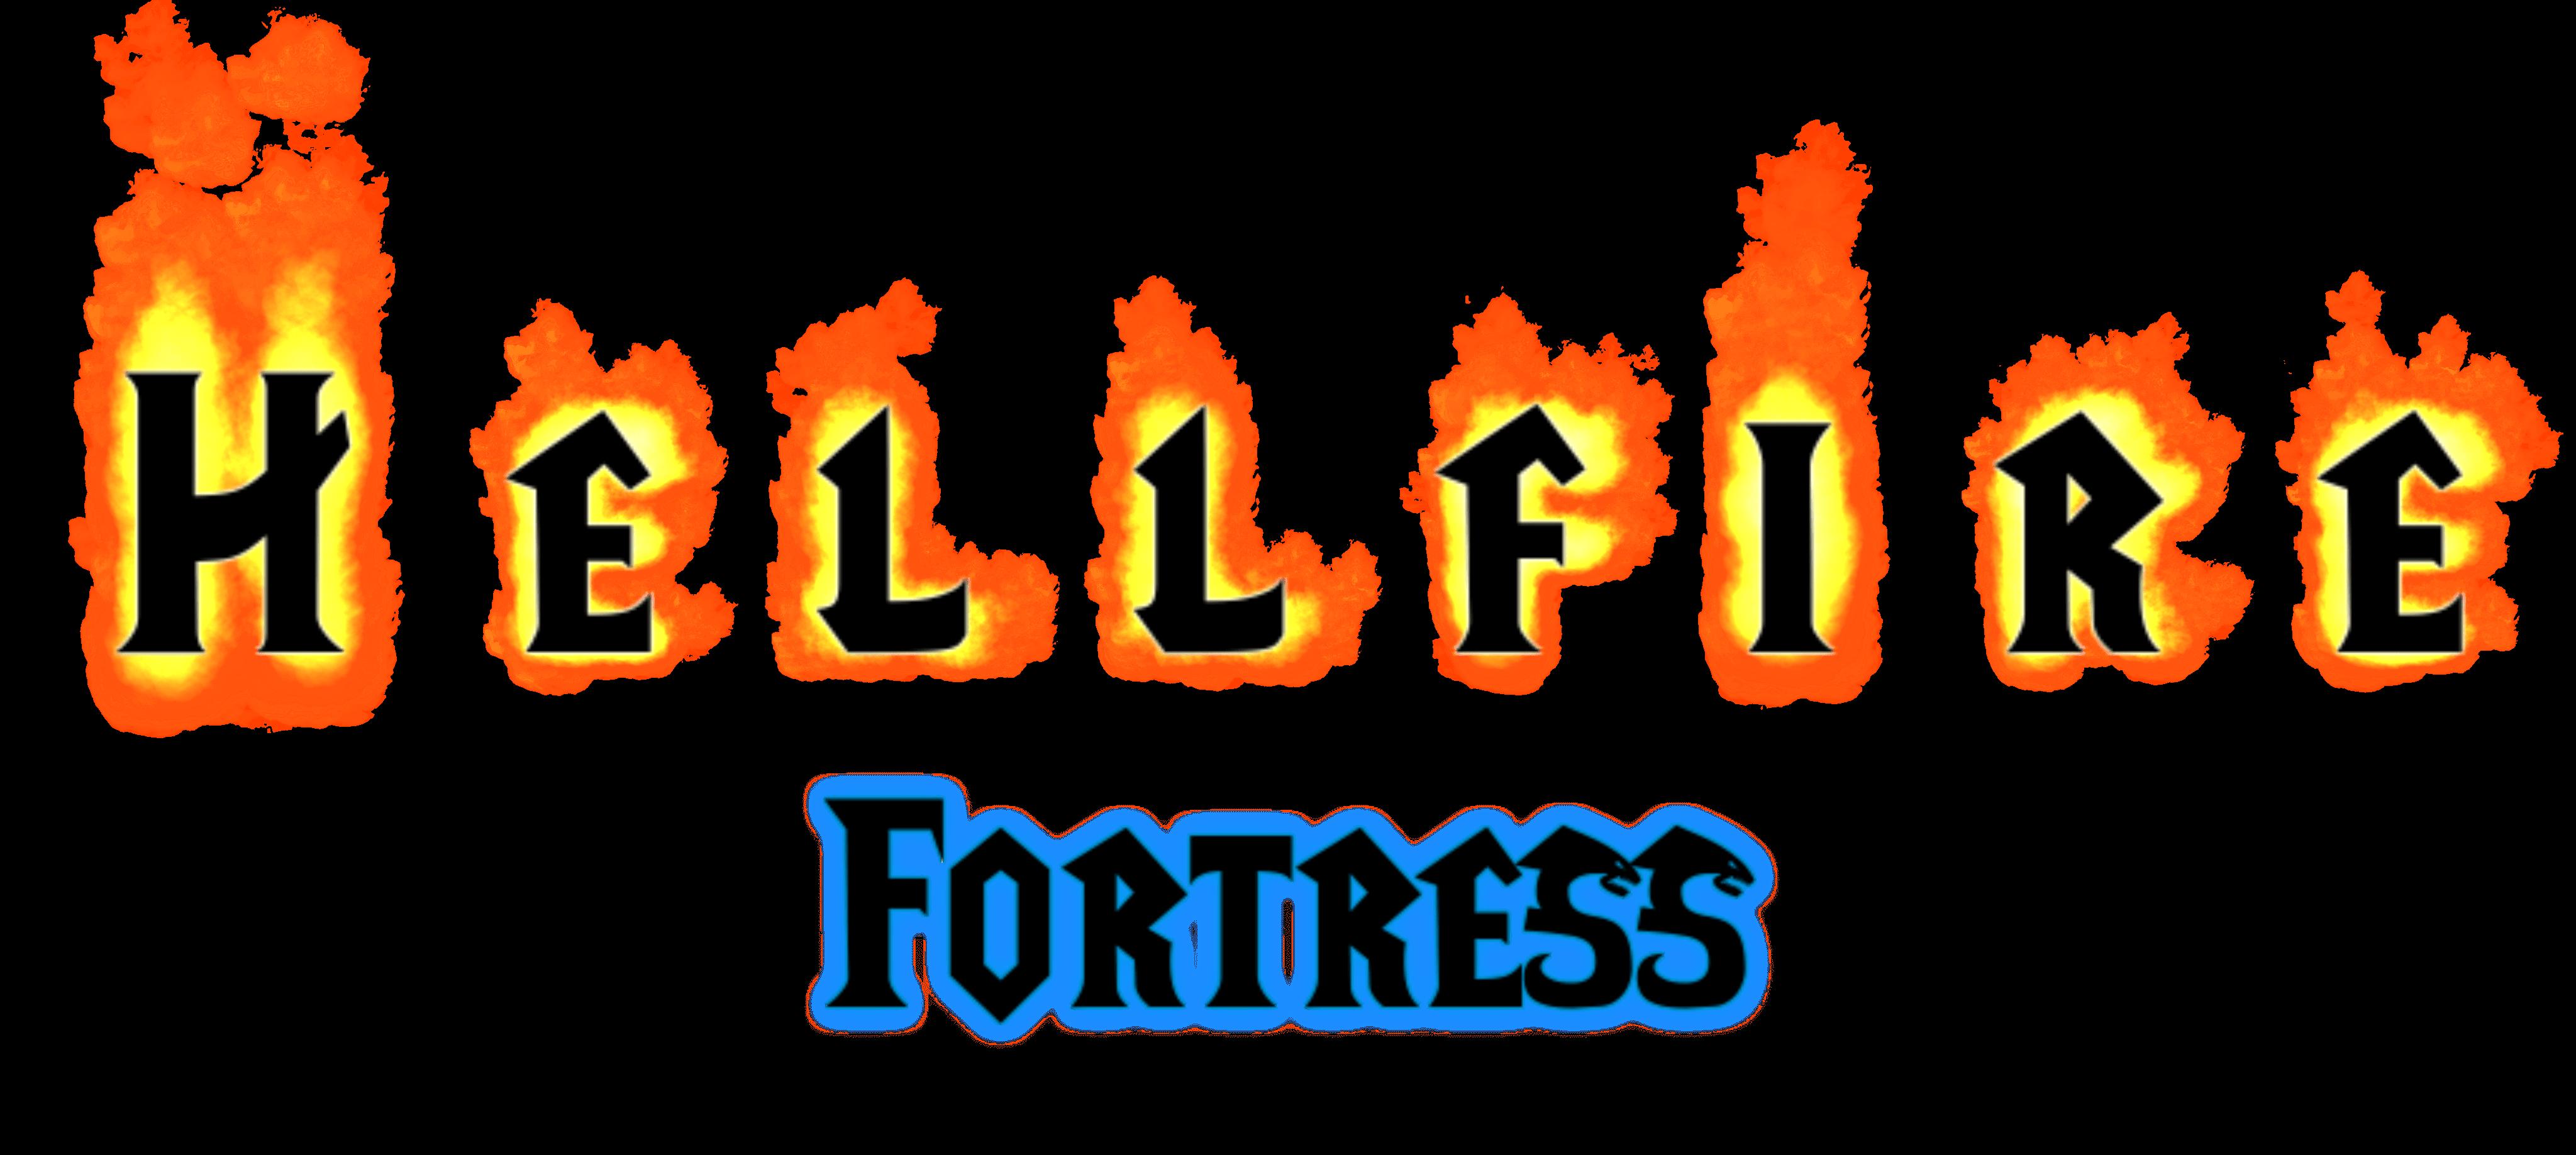 Hellfire Fortress